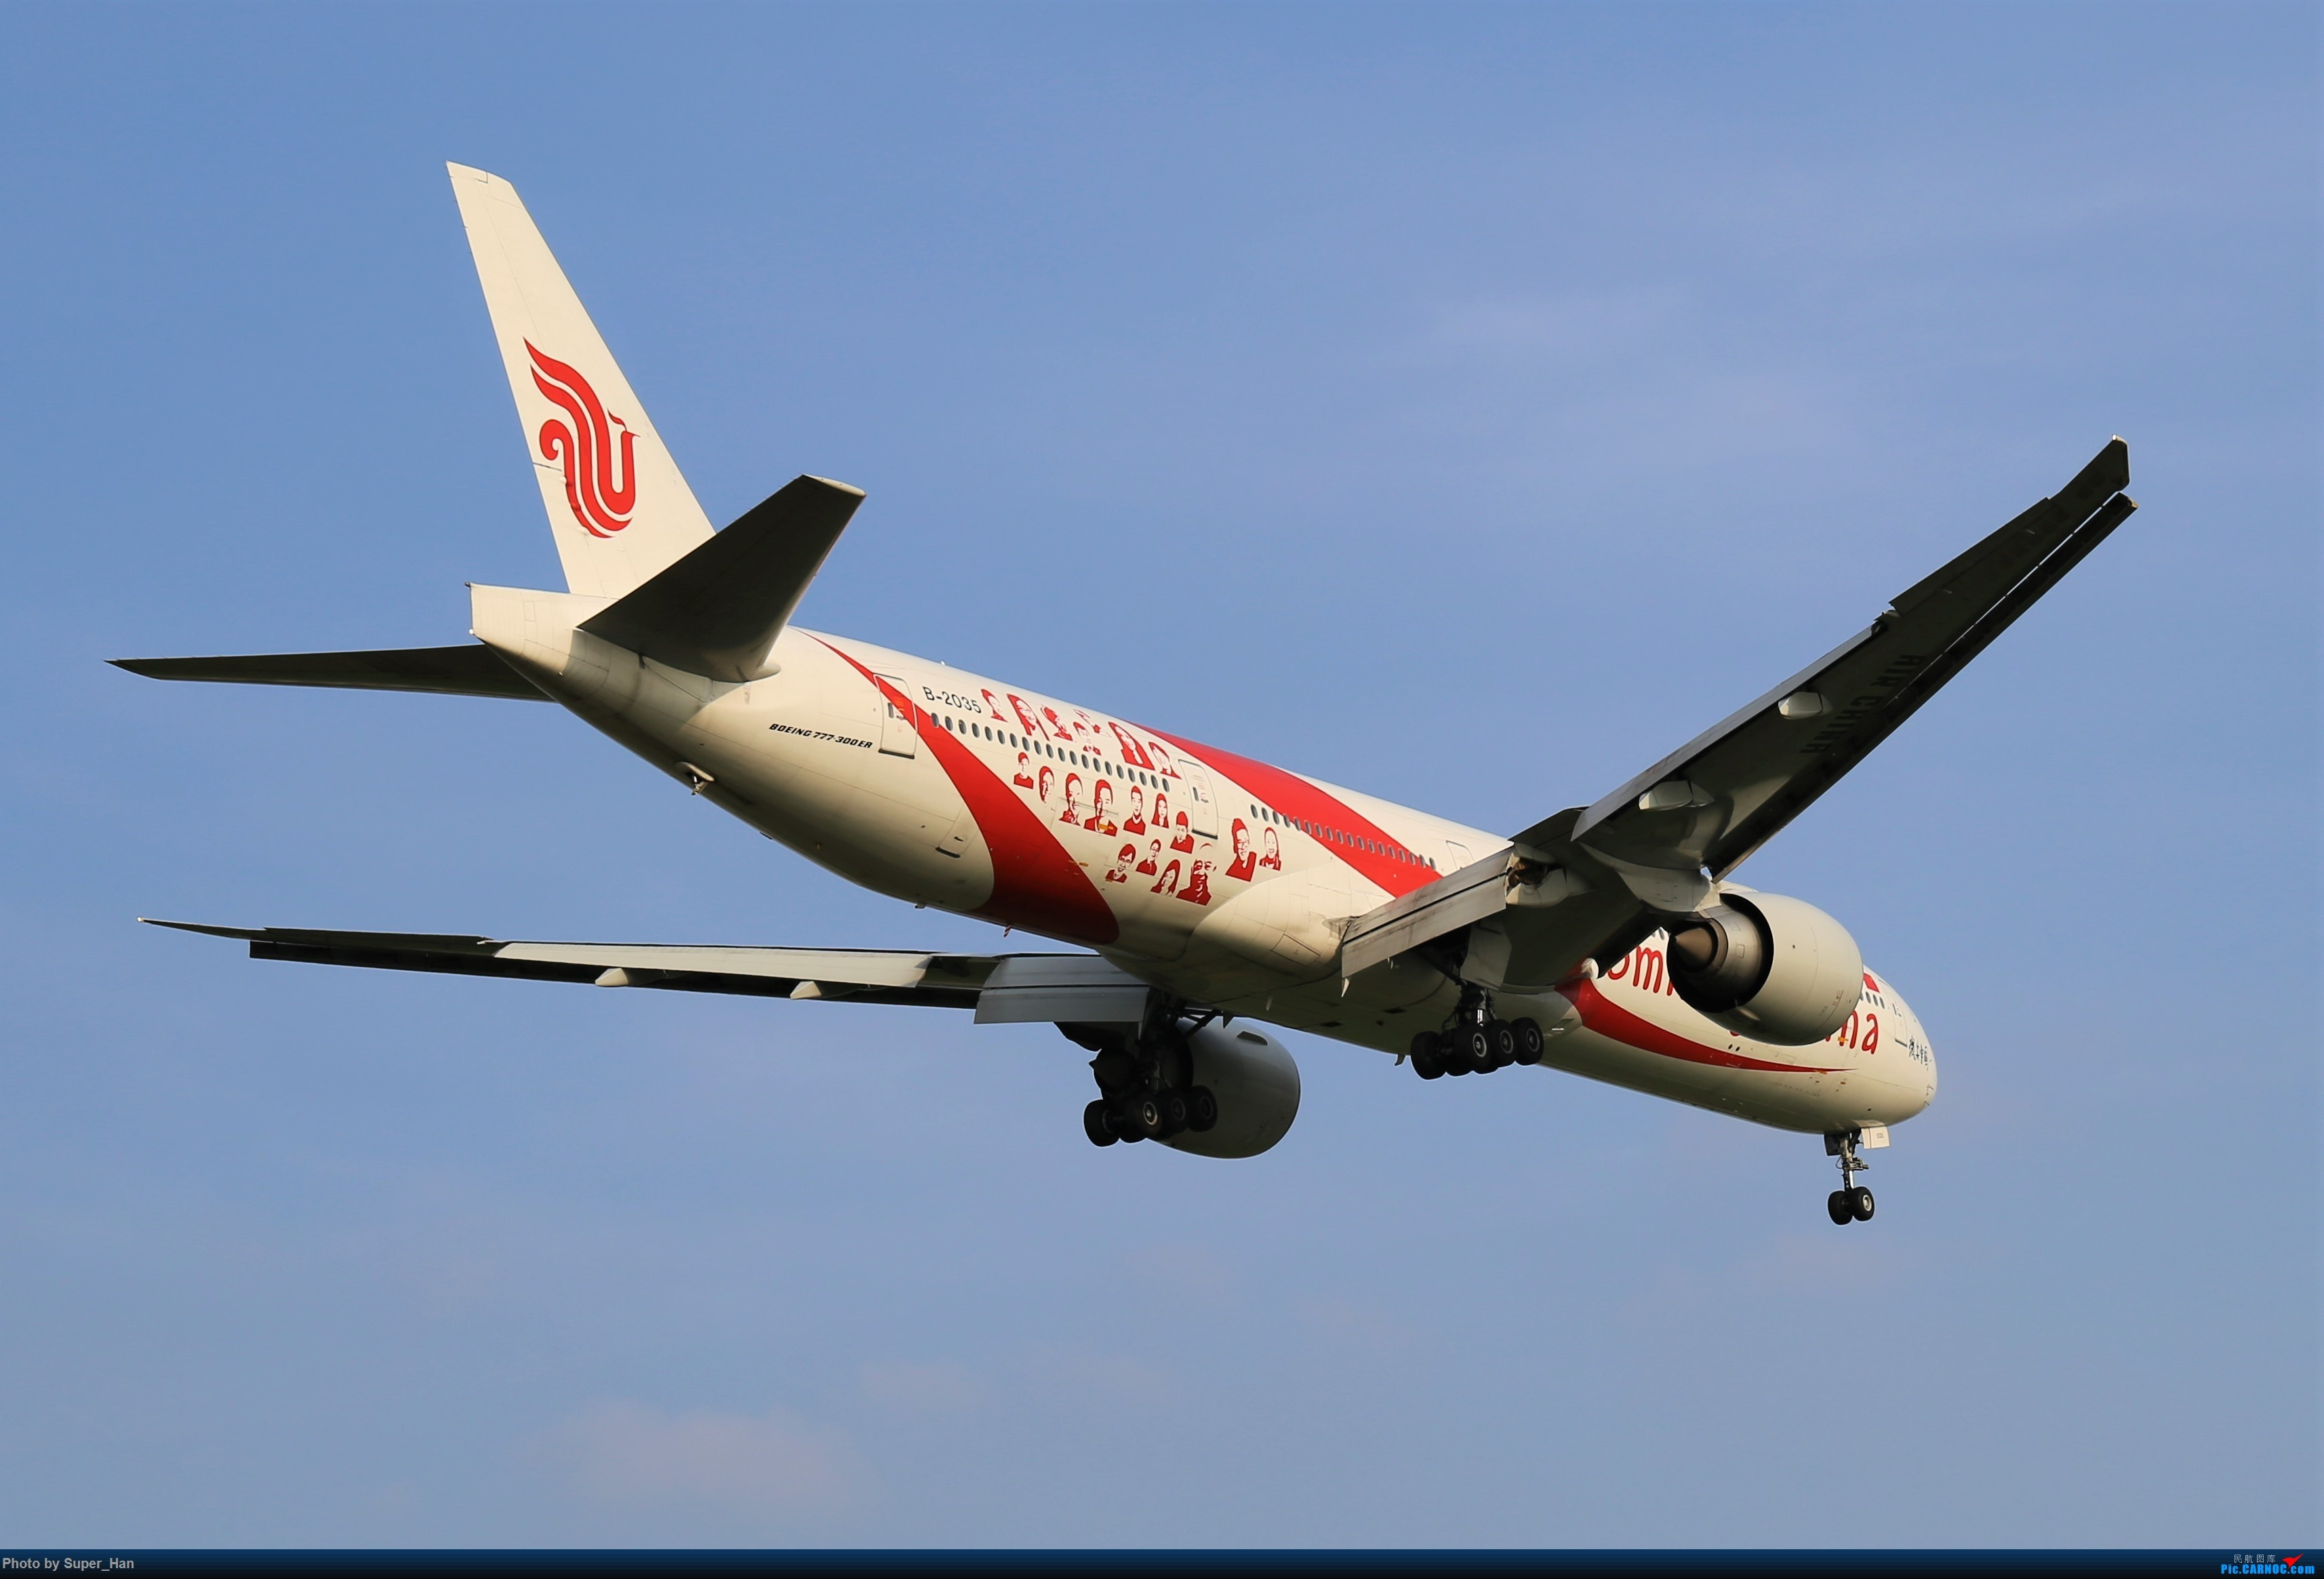 Re:[原创]【杭州飞友会】0715去虹桥说走就走【777篇】 BOEING 777-300ER B-2035 中国上海虹桥国际机场